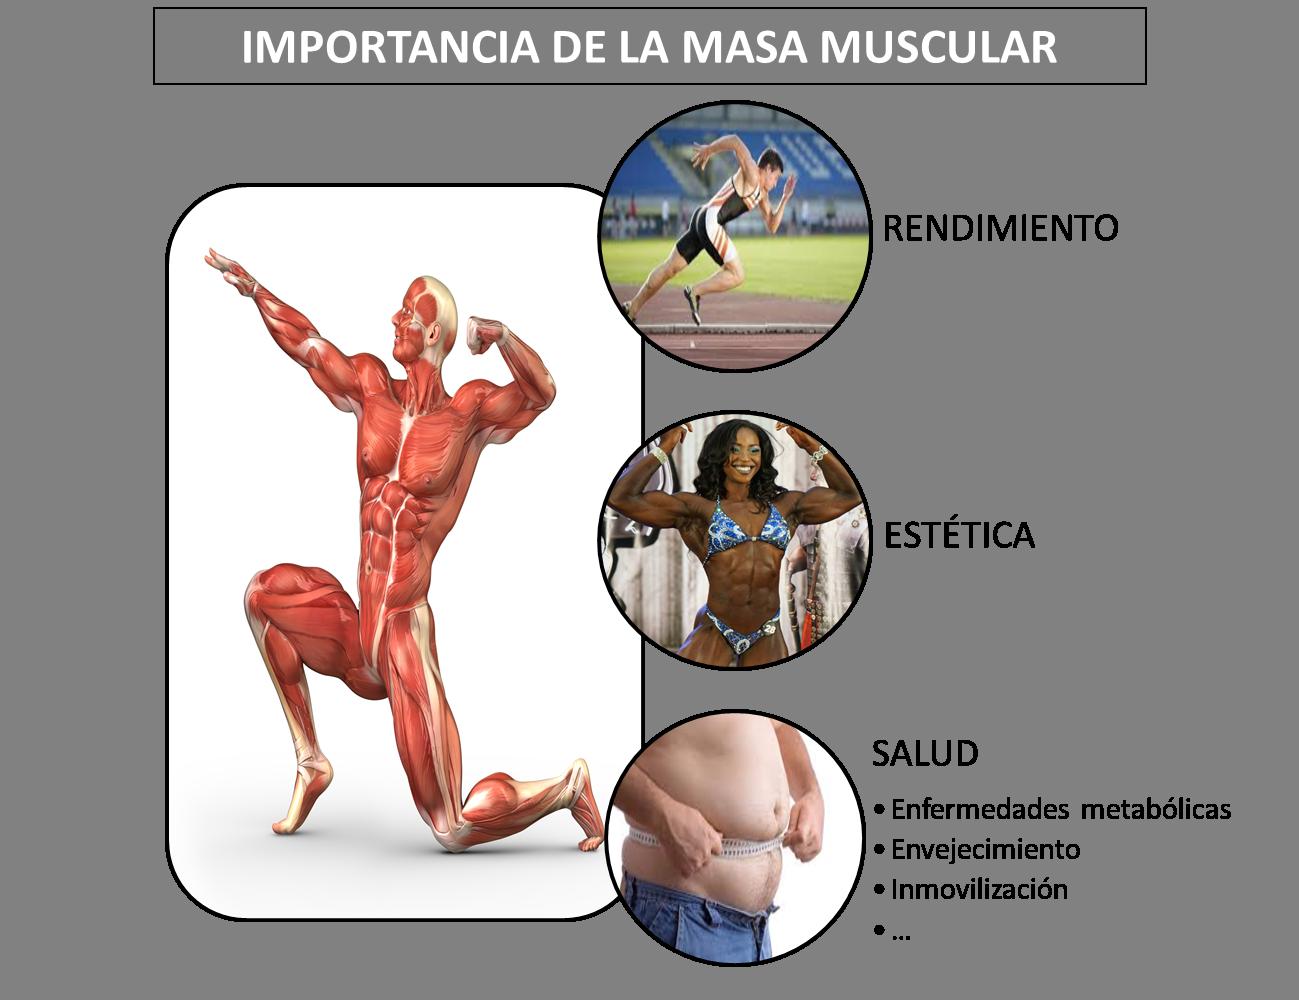 fissac _ fisiología hipertrofia